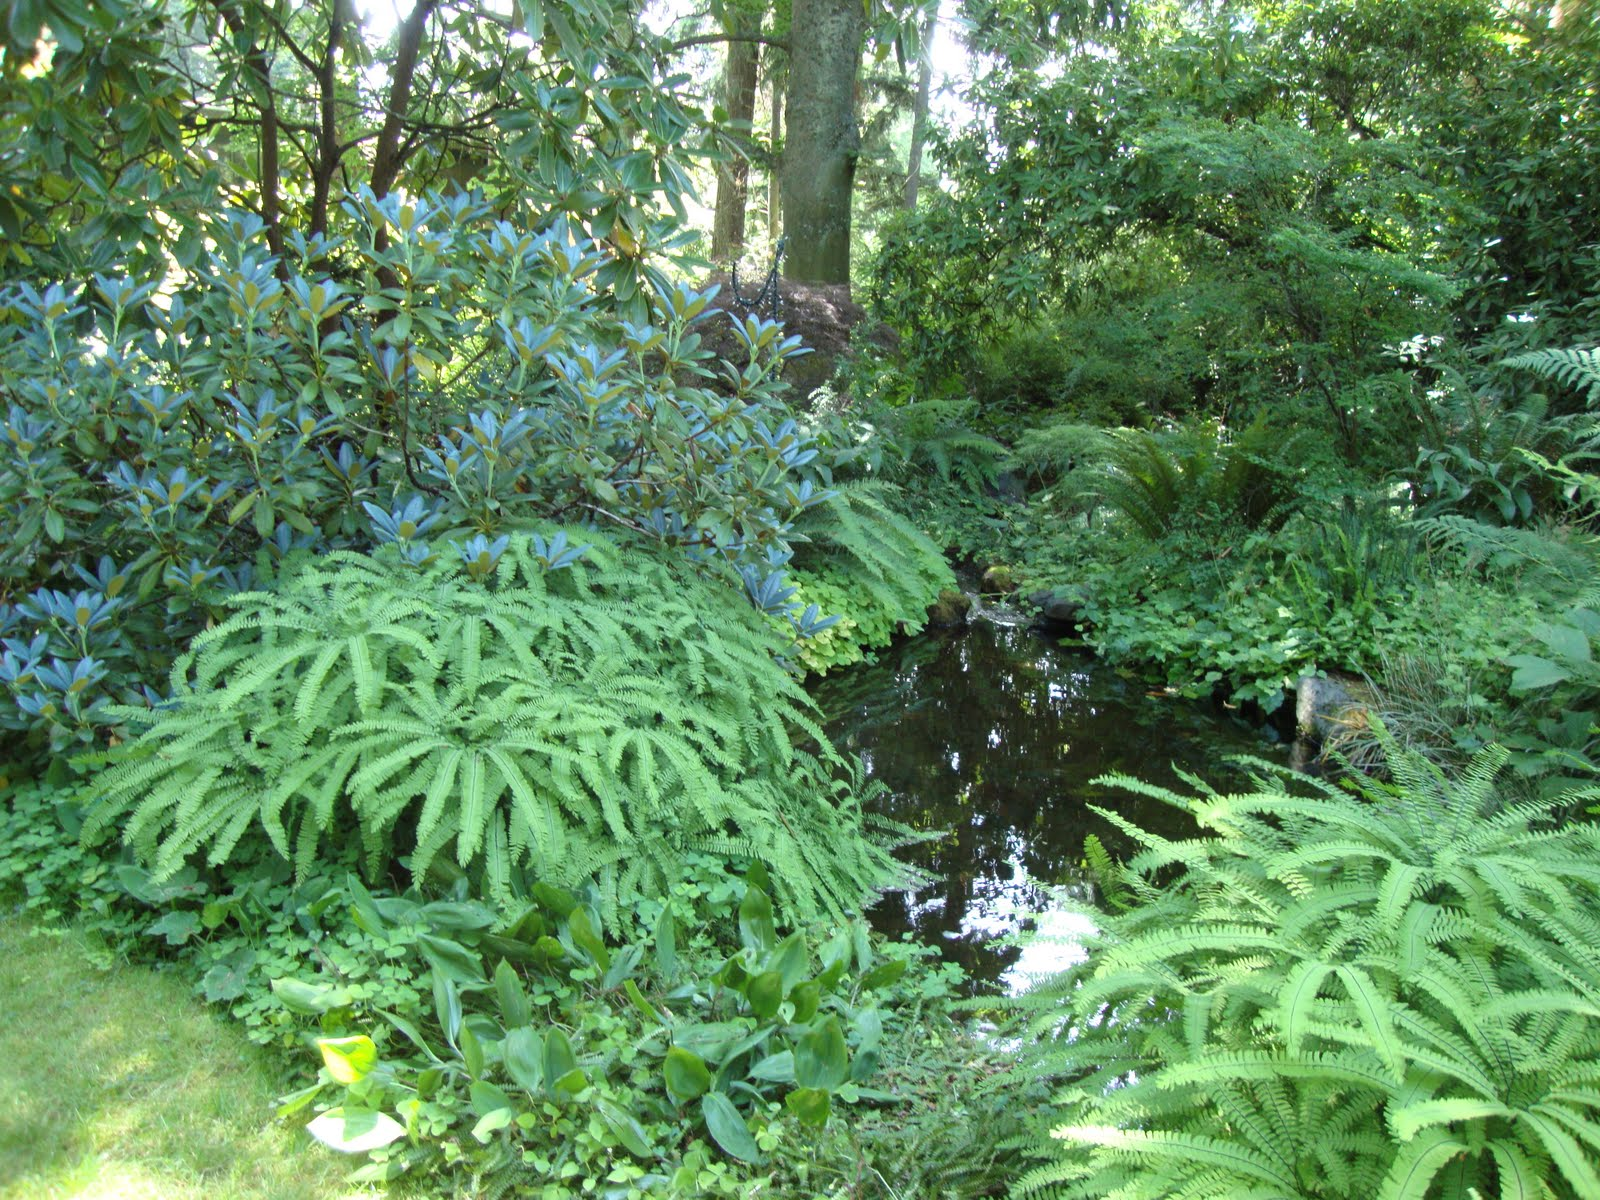 Garden Ideas II on Pinterest Shade Garden Cottage